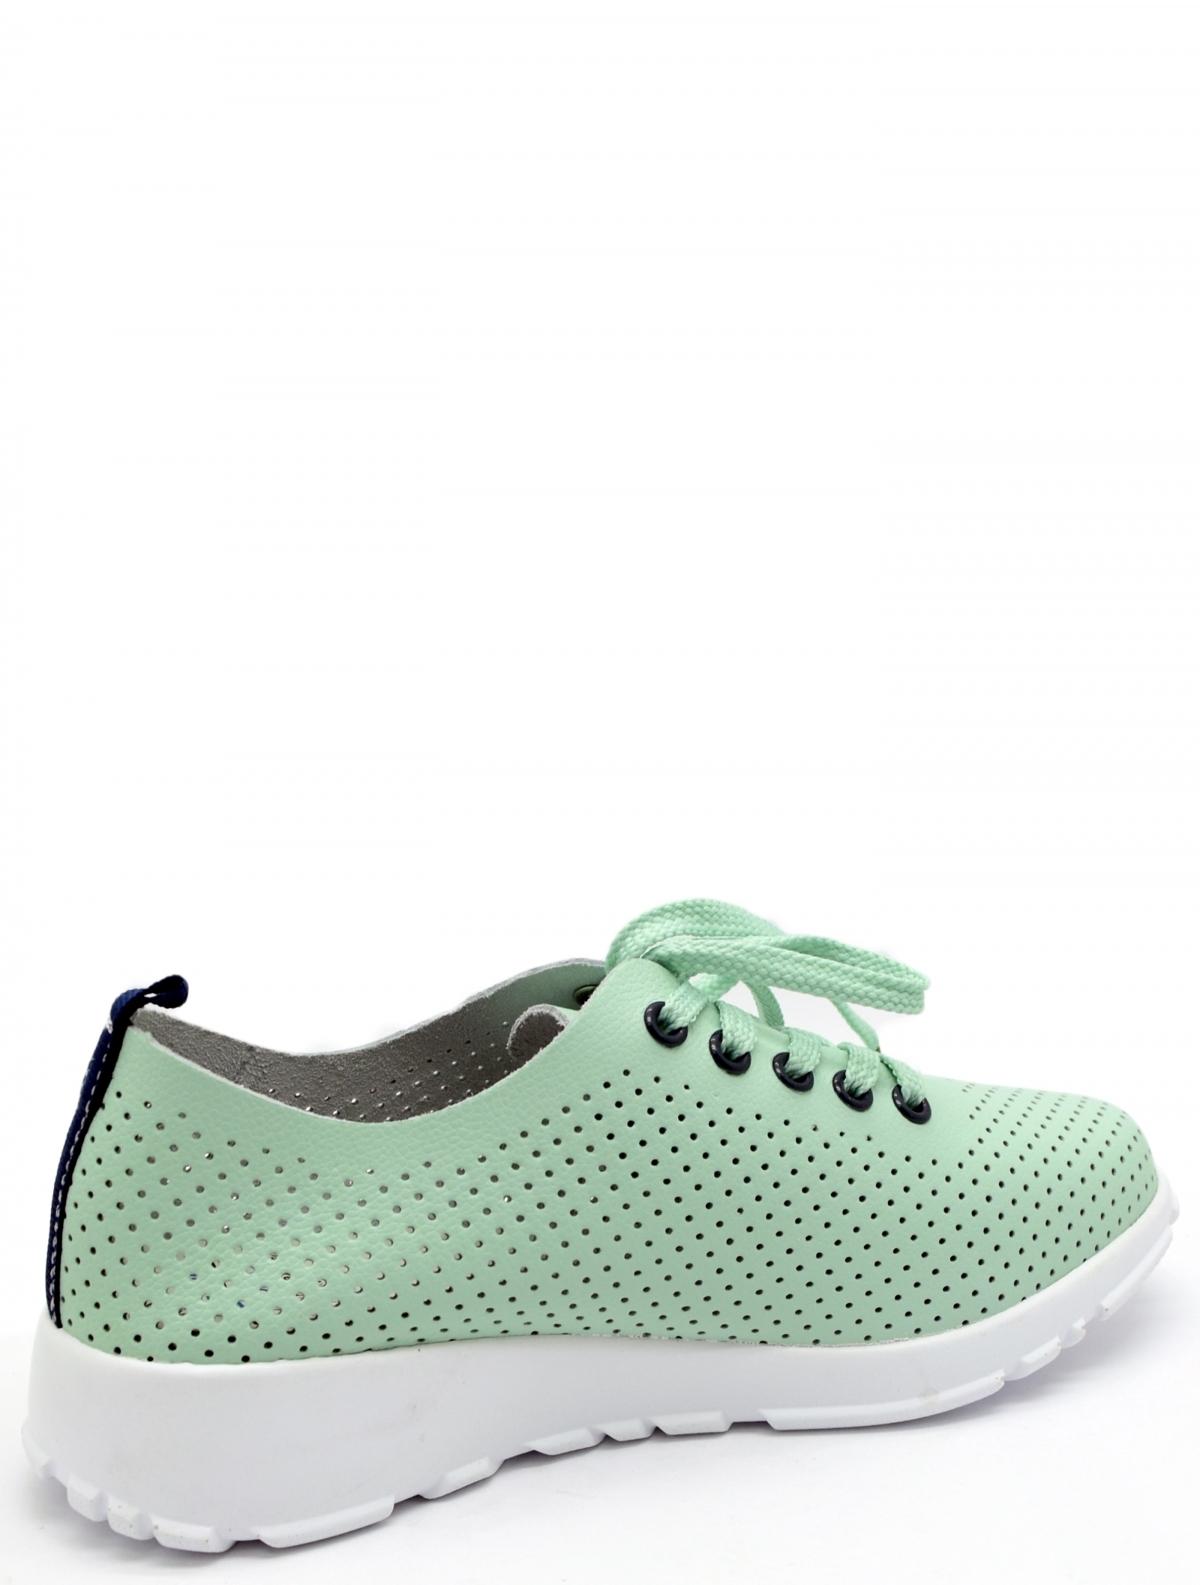 Rio Fiore 17206HB-GR женские кроссовки